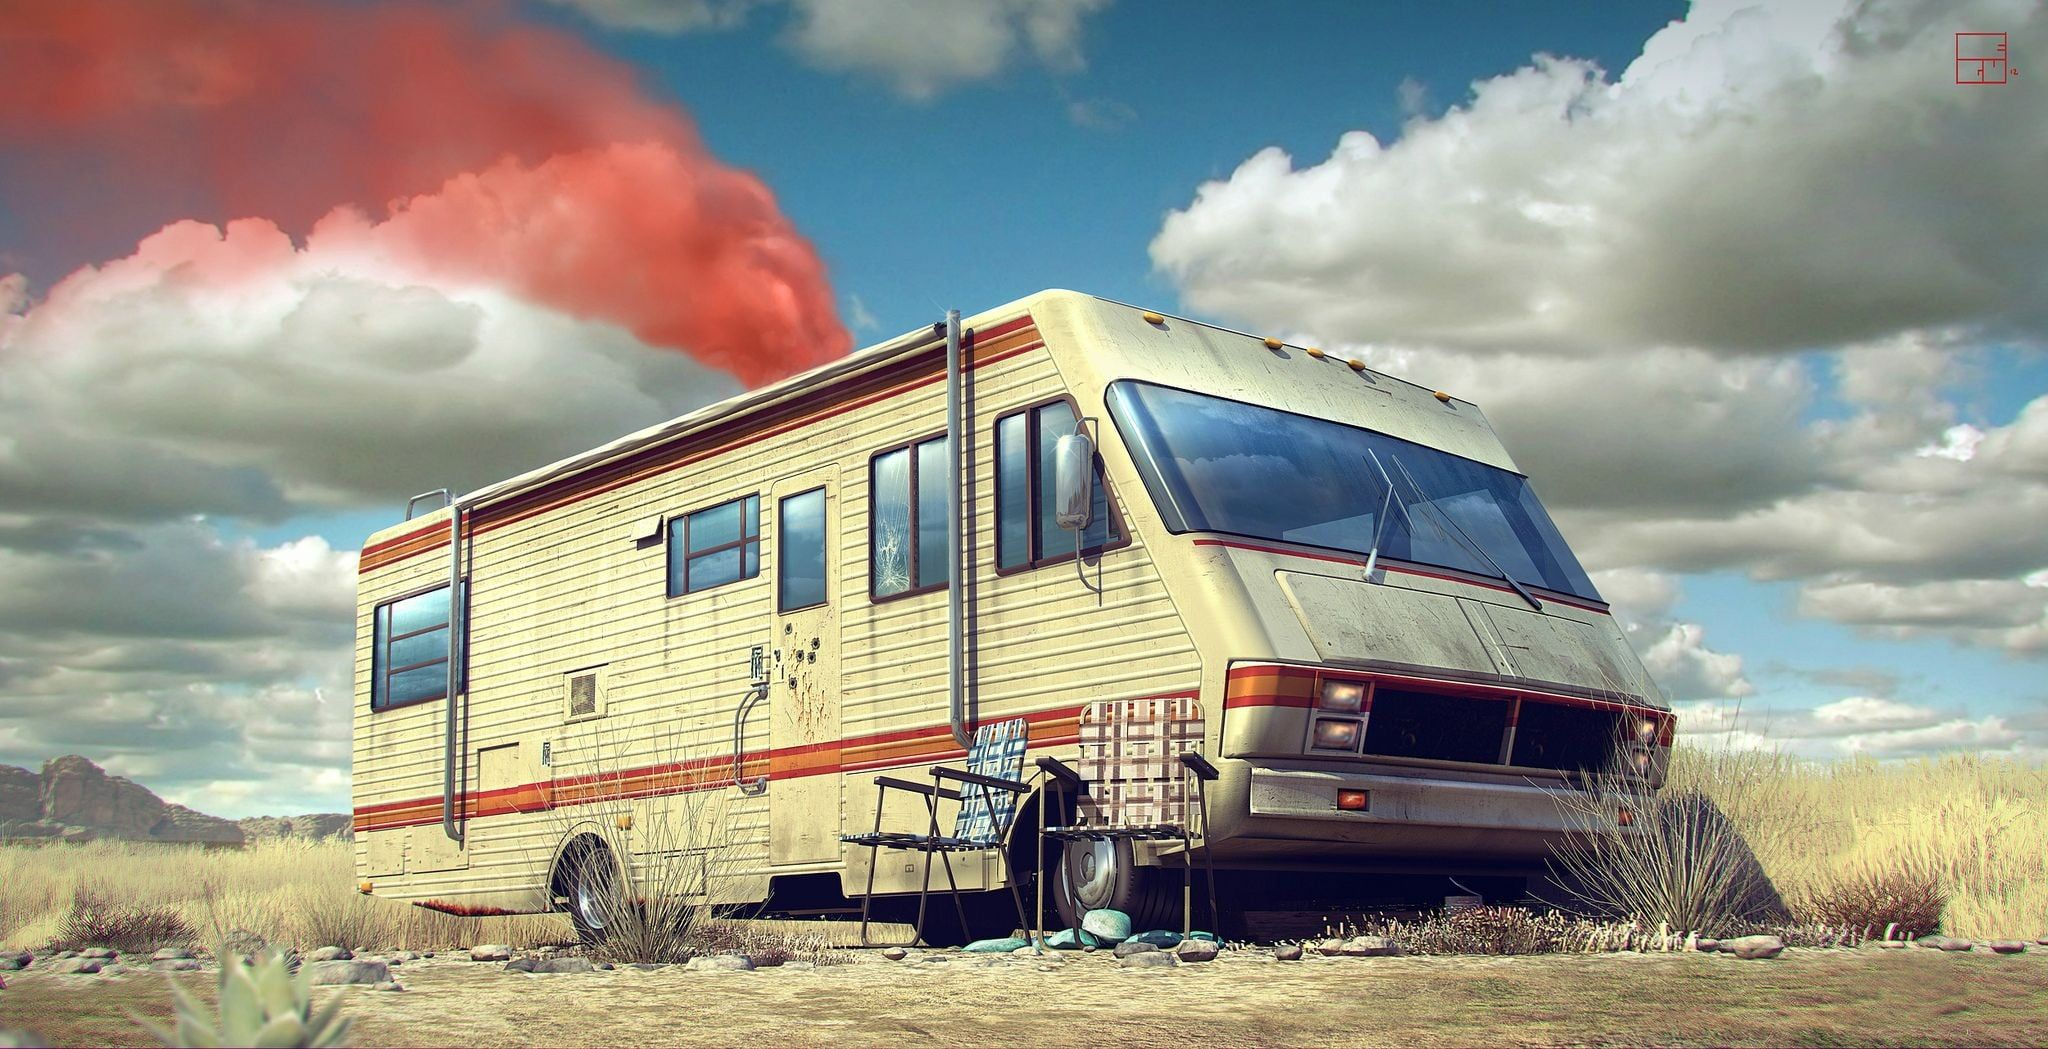 Breaking Bad Rv Tv 1080p Wallpaper Hdwallpaper Desktop Breaking Bad Breaking Bad Tv Series Recreational Vehicles